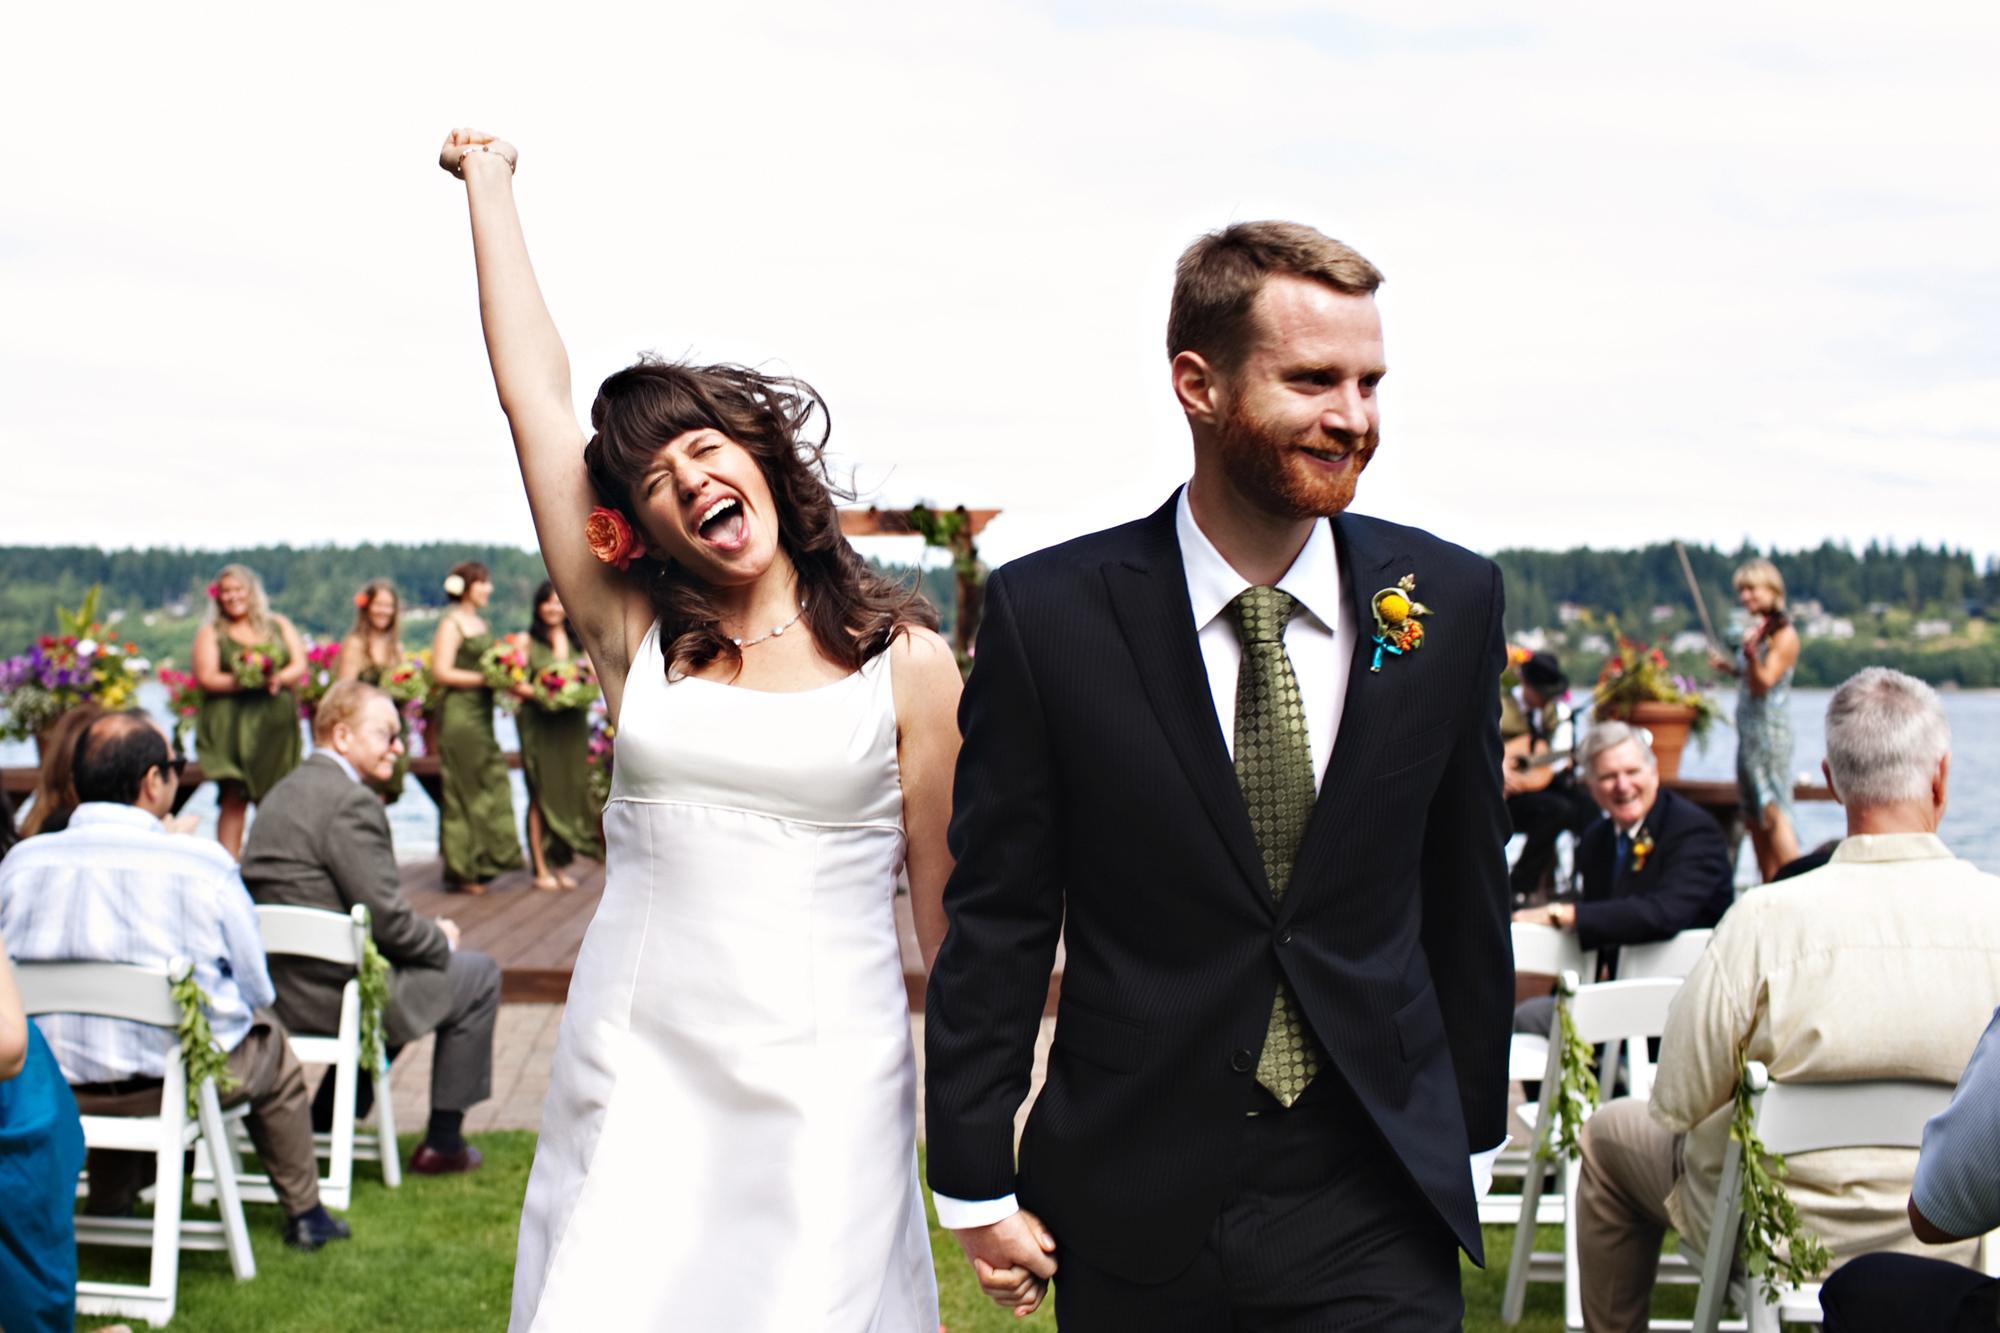 Estatic bride and groom celebrate being married - photo by Jenny Jimenez